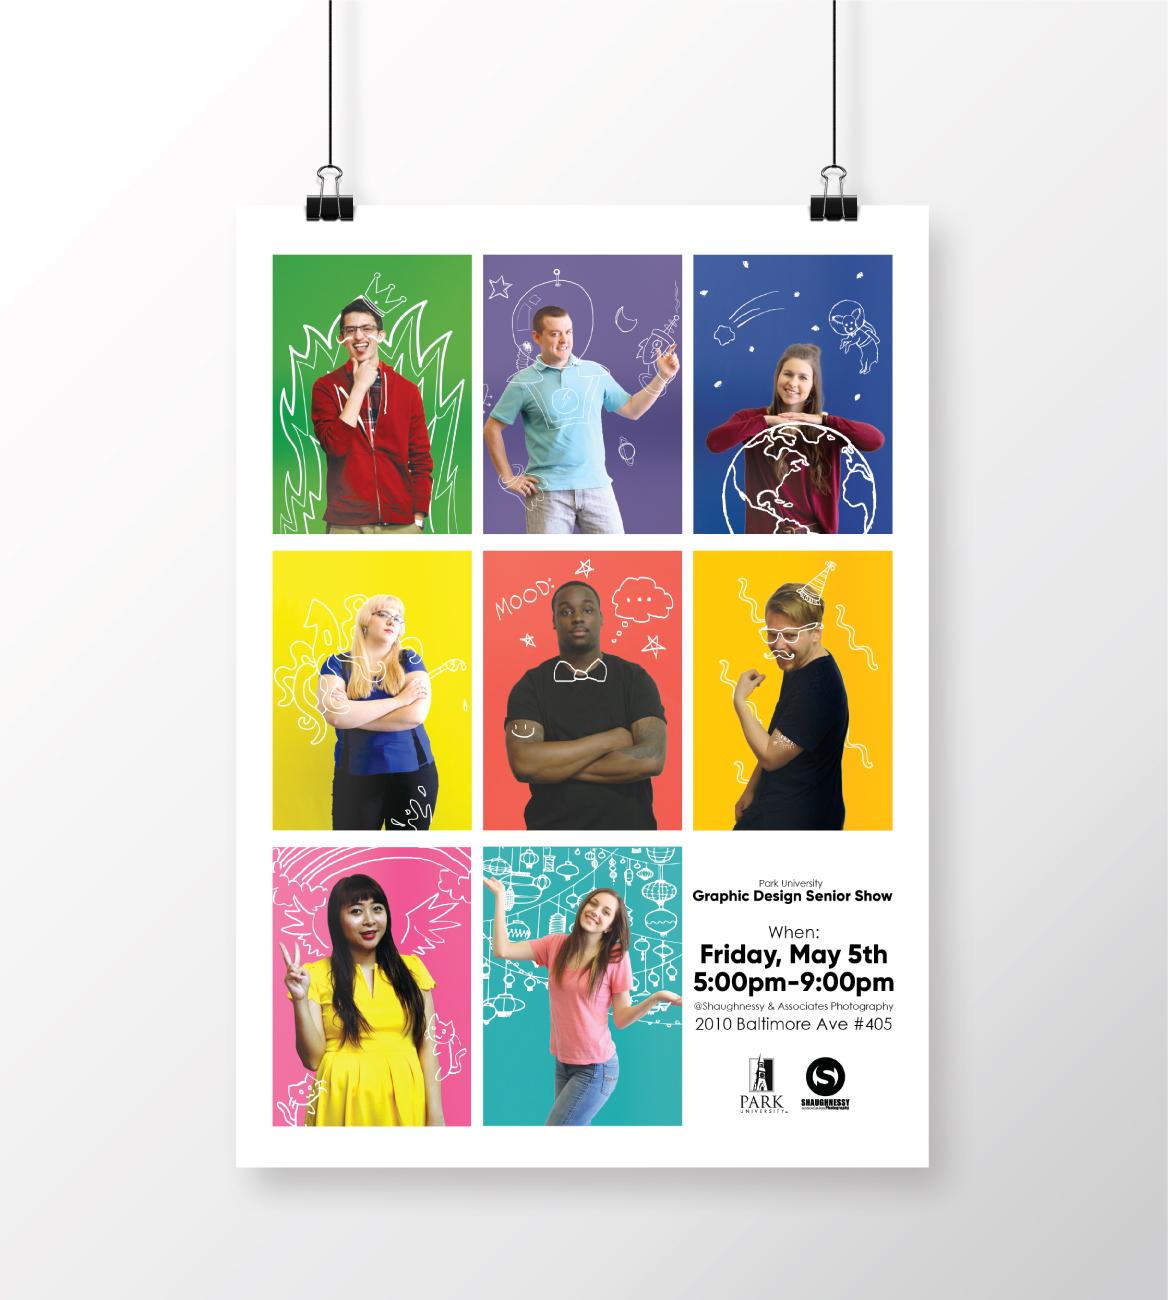 Senior Show Promotional Campaign